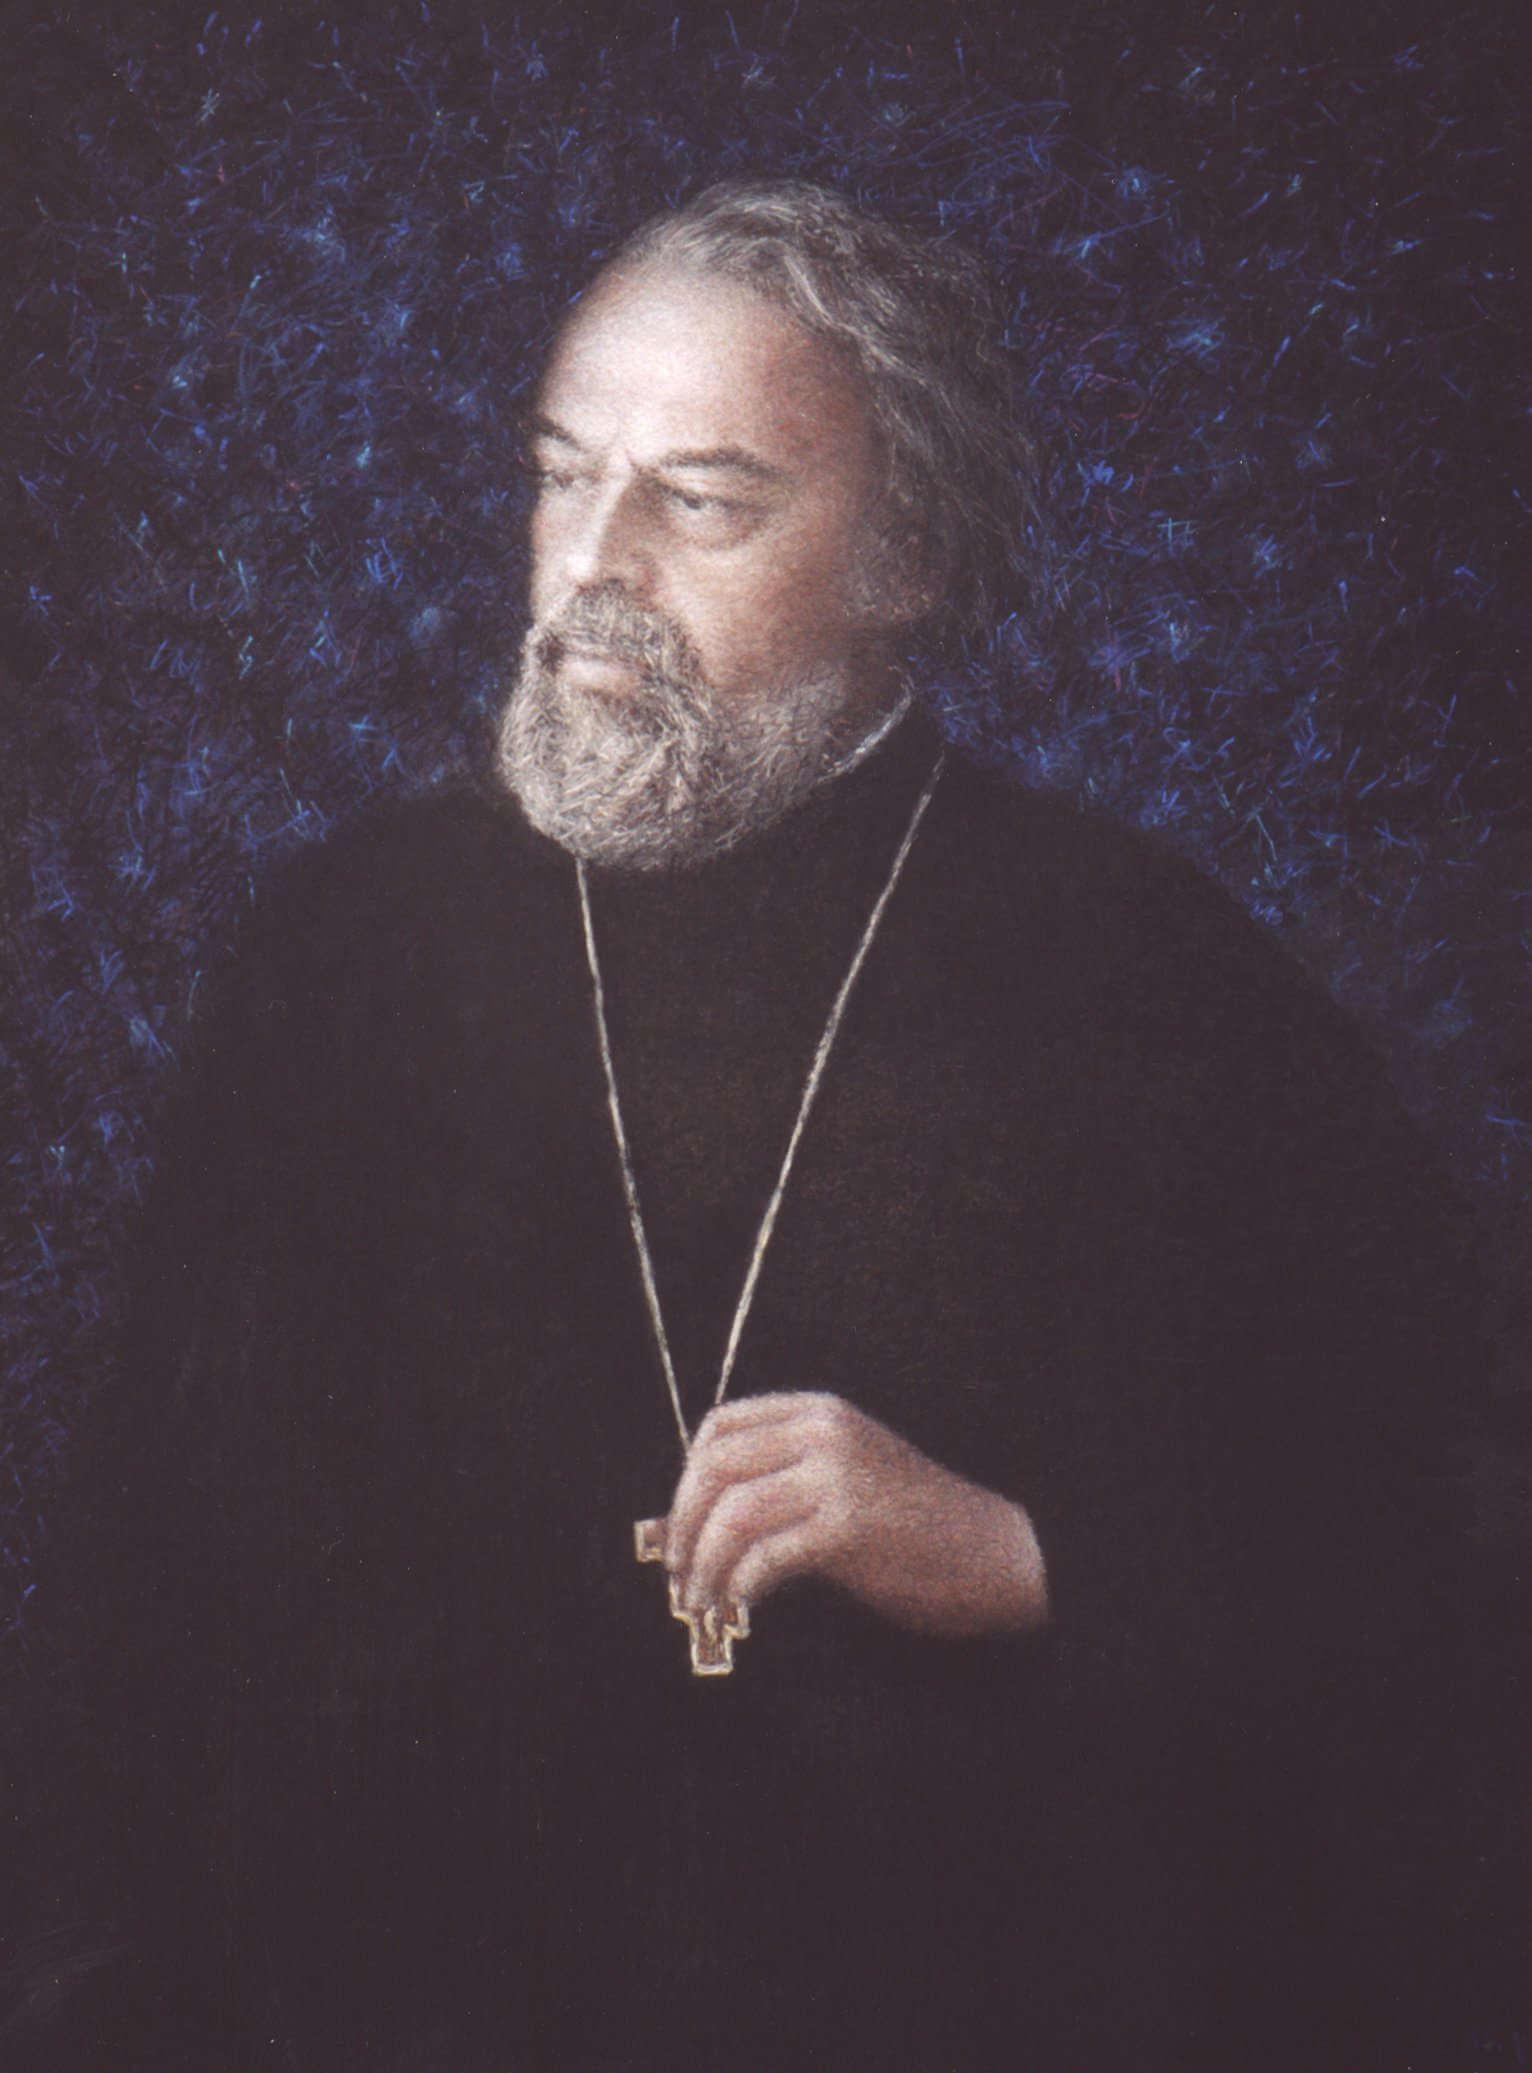 Аркадий Паранский «Портрет Александра Меня»